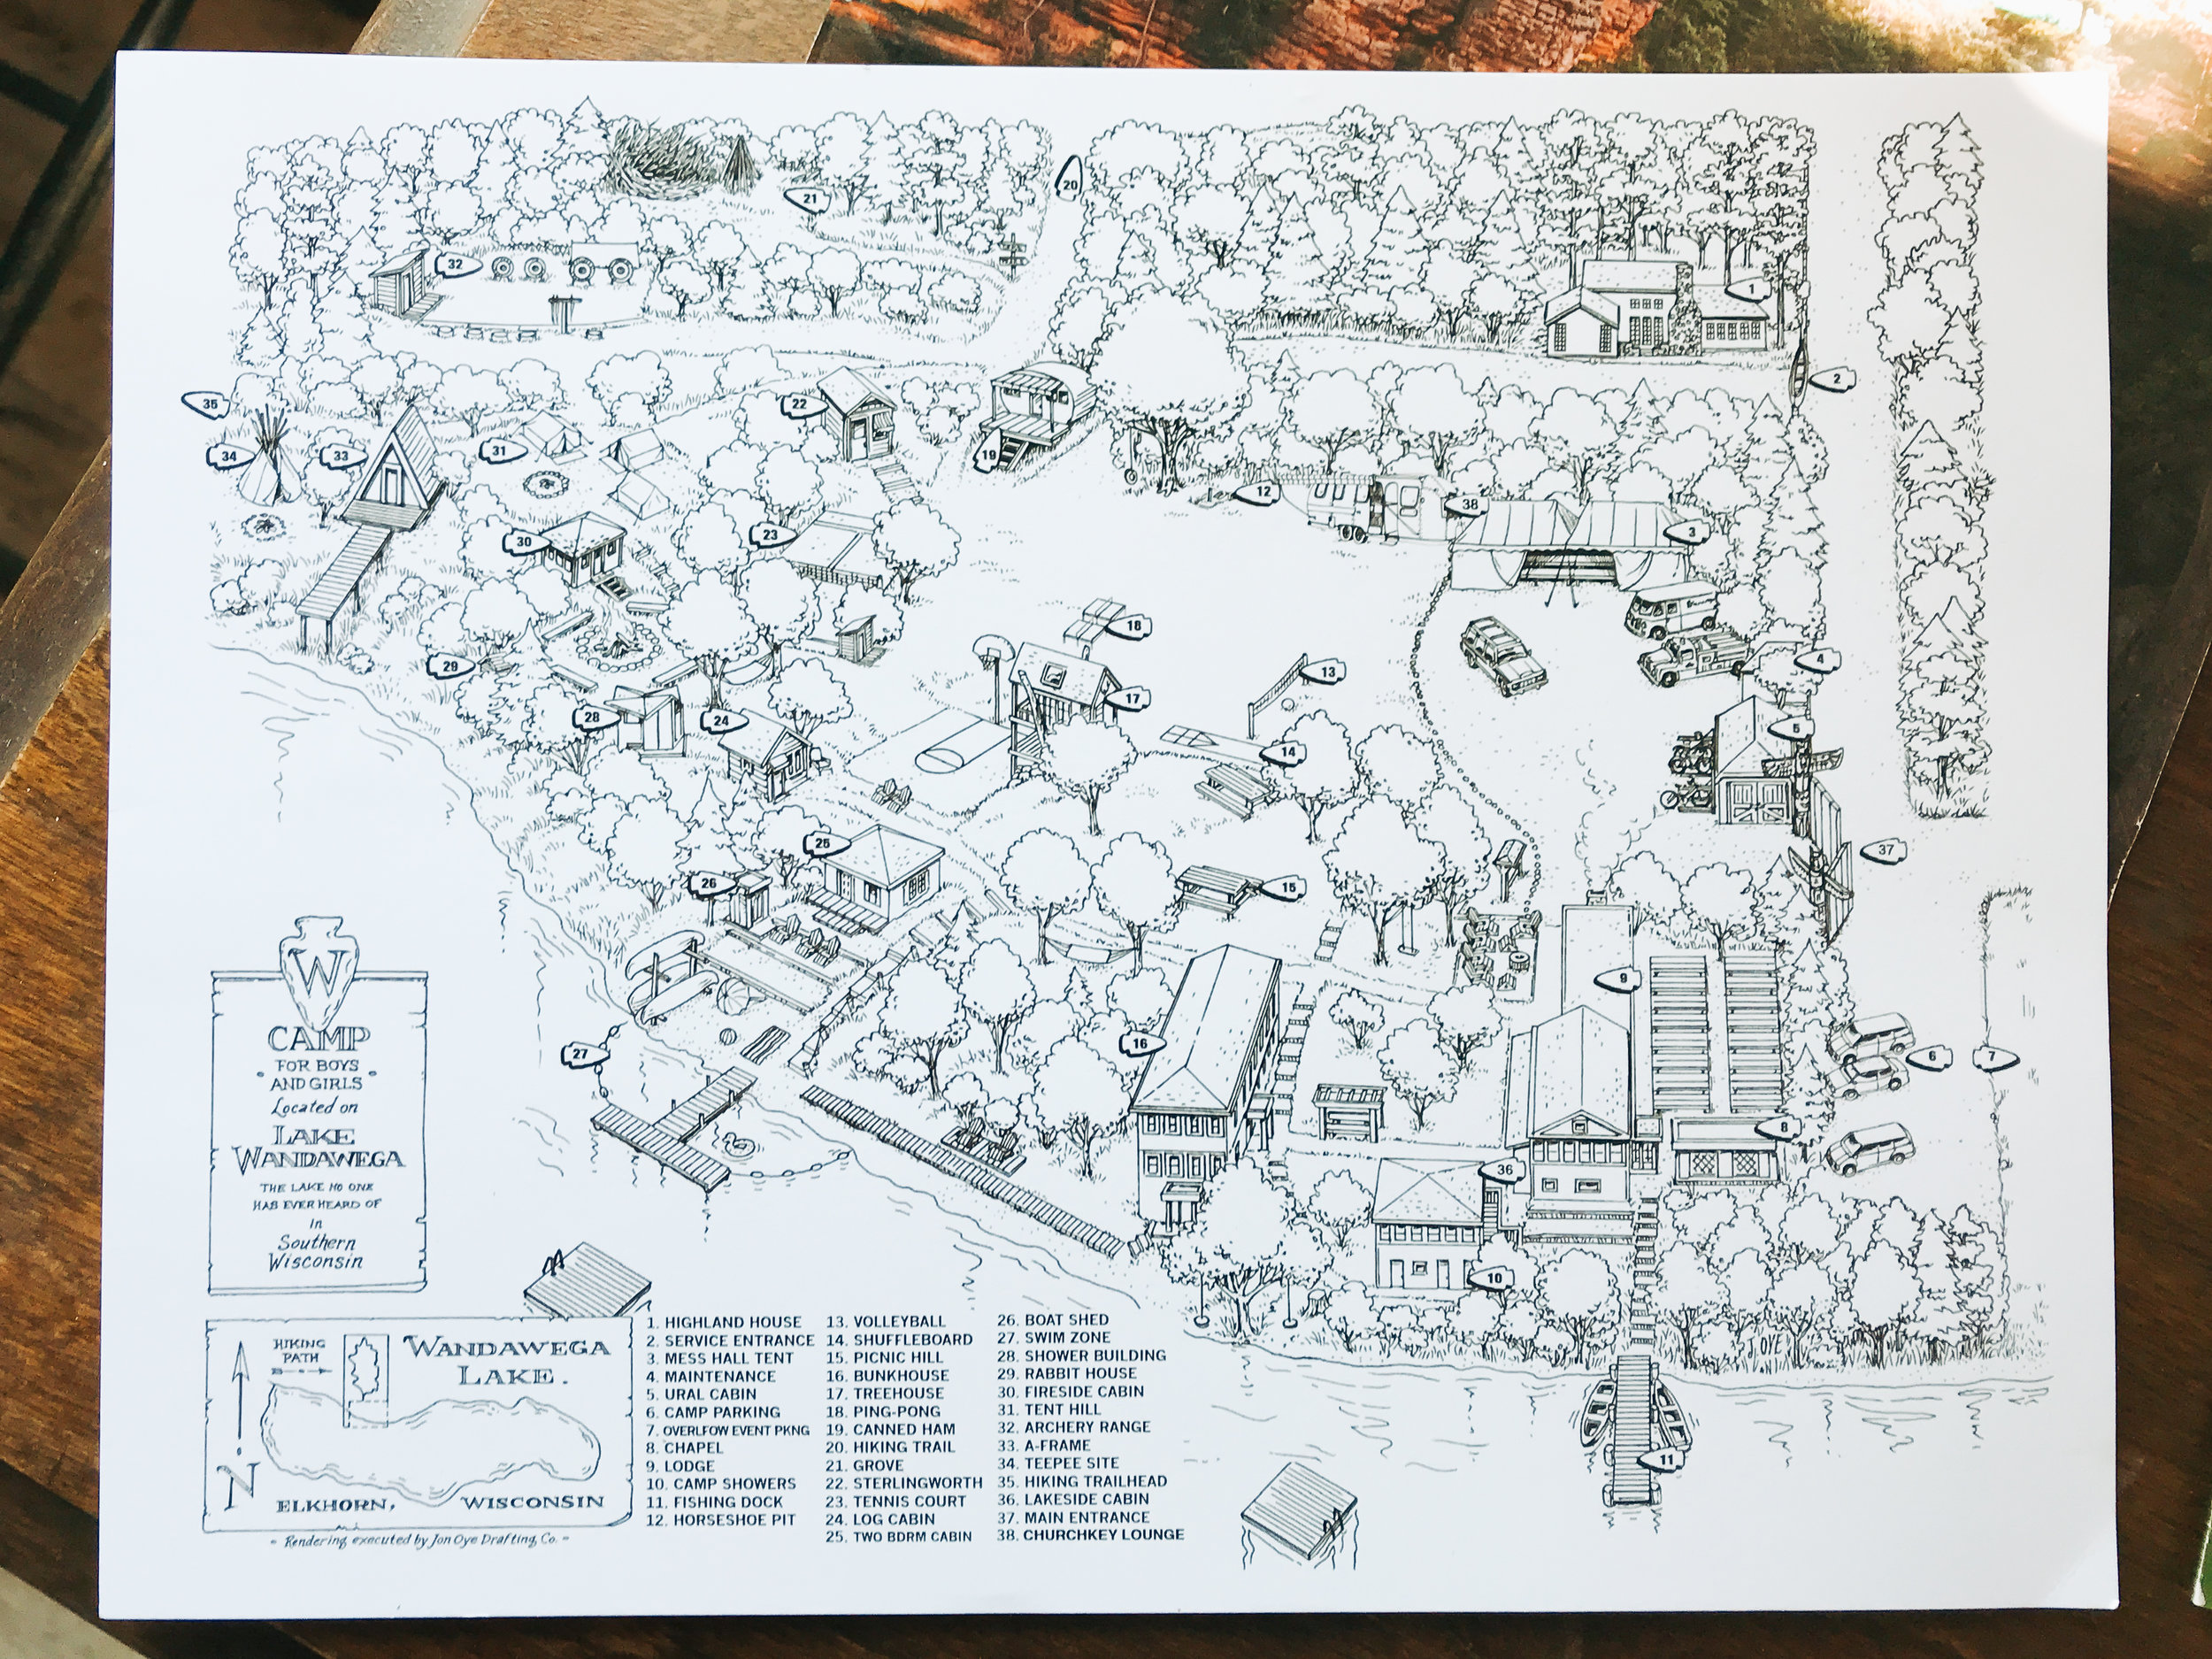 camp_wandawega_map_activities_lodges_cabin.jpg